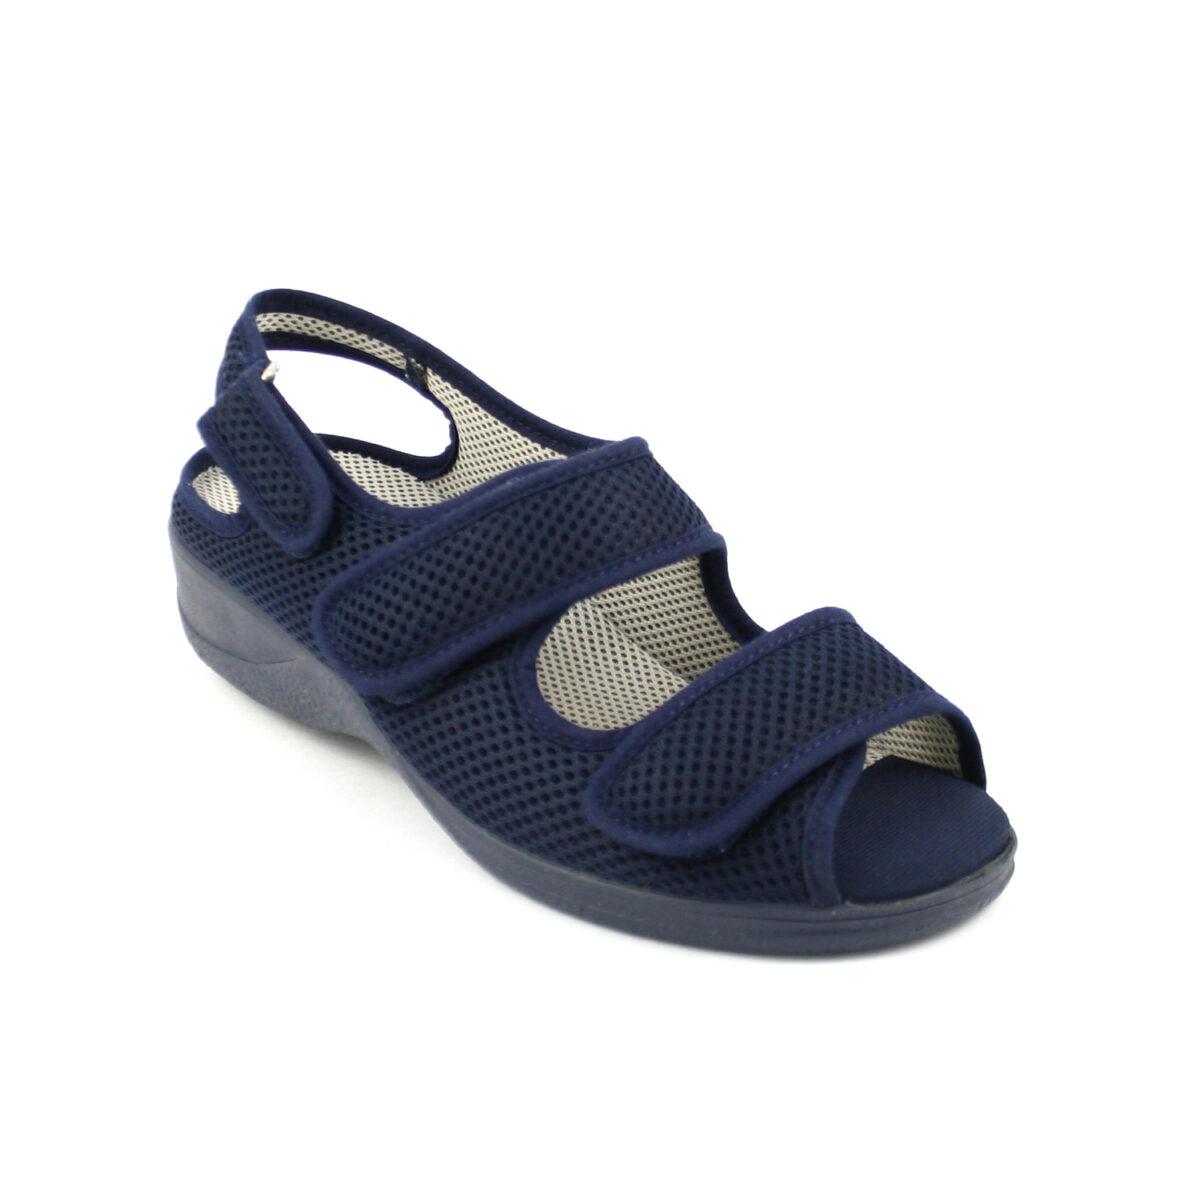 21821 Sandalia Cutillas Horma Ancha Doctor Velcros Plantilla Foam wmvN80n